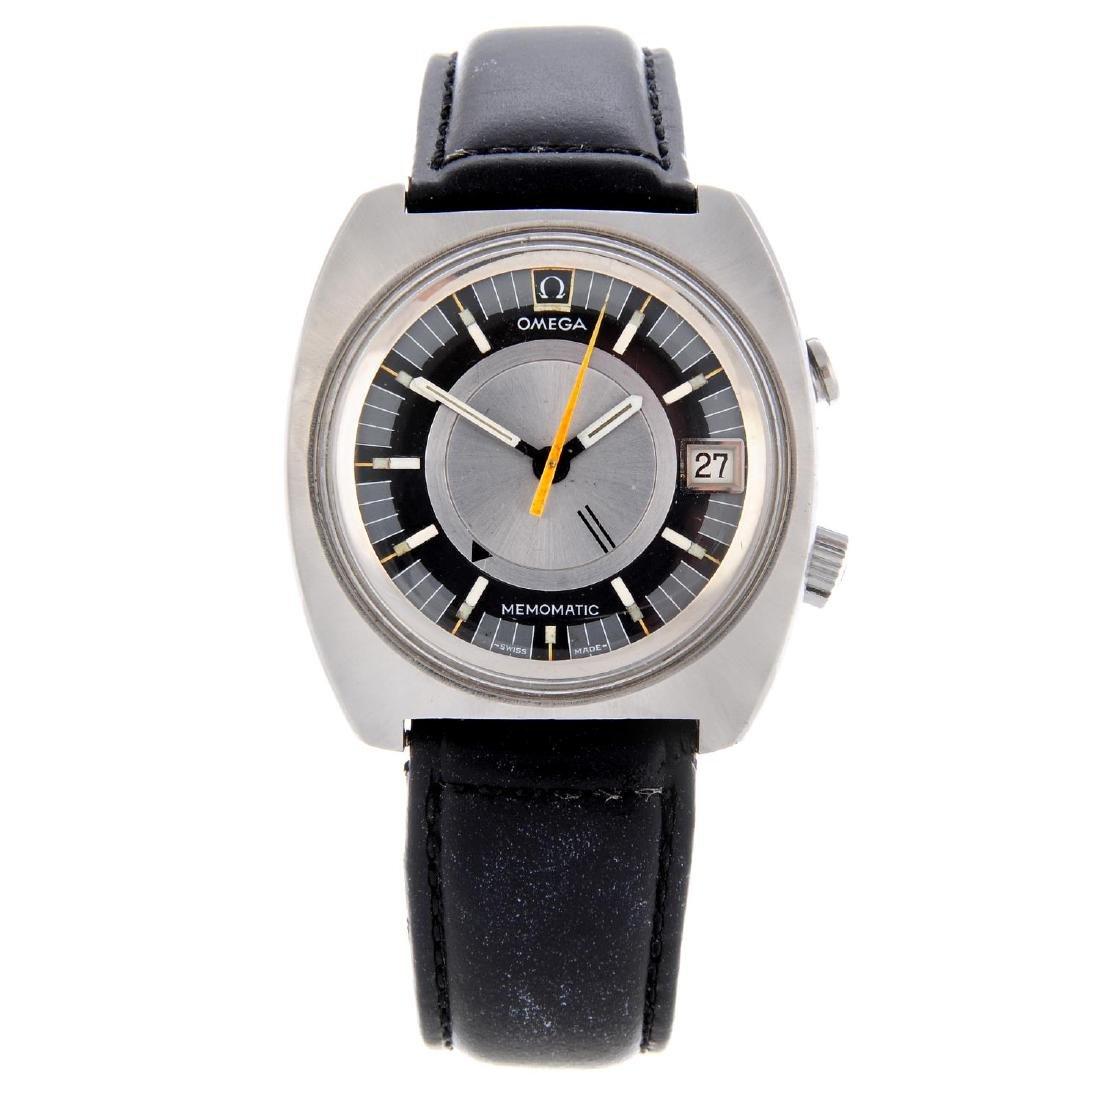 OMEGA - a gentleman's Seamaster Memomatic wrist watch.